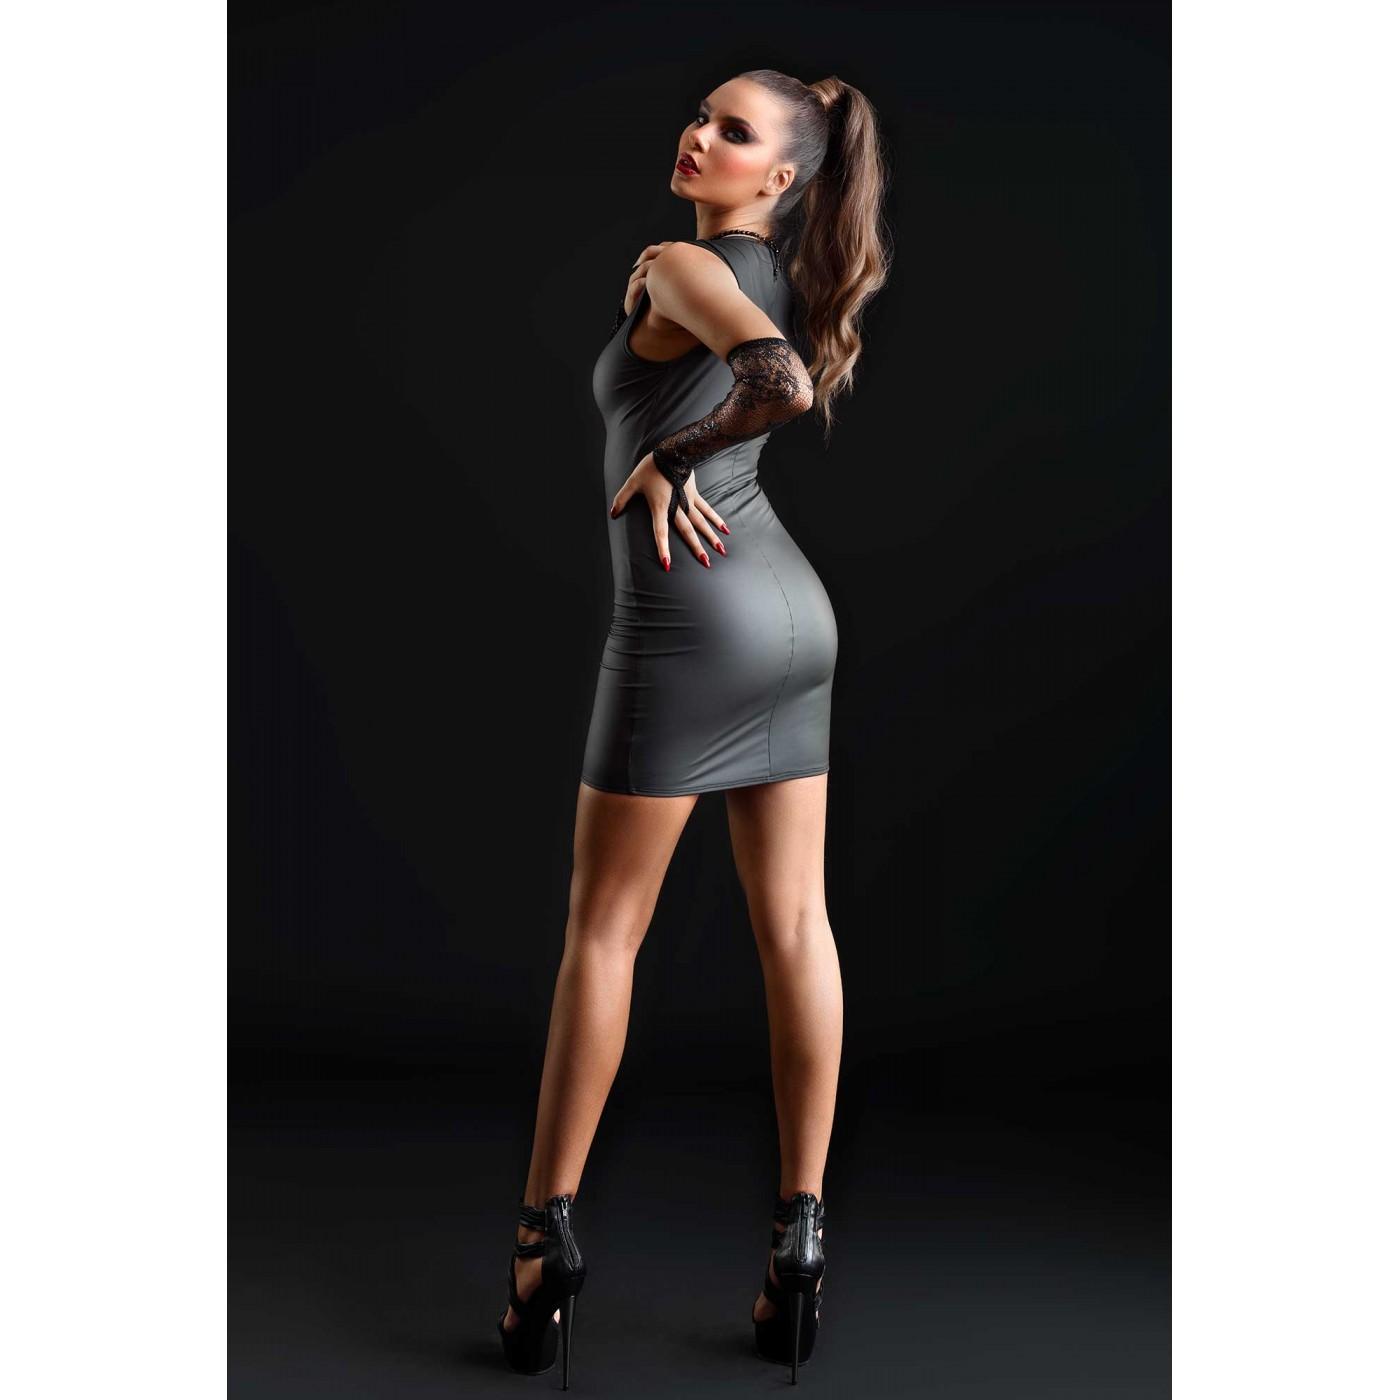 Tabitha, sexy matt wetlook dress - Patrice Catanzaro